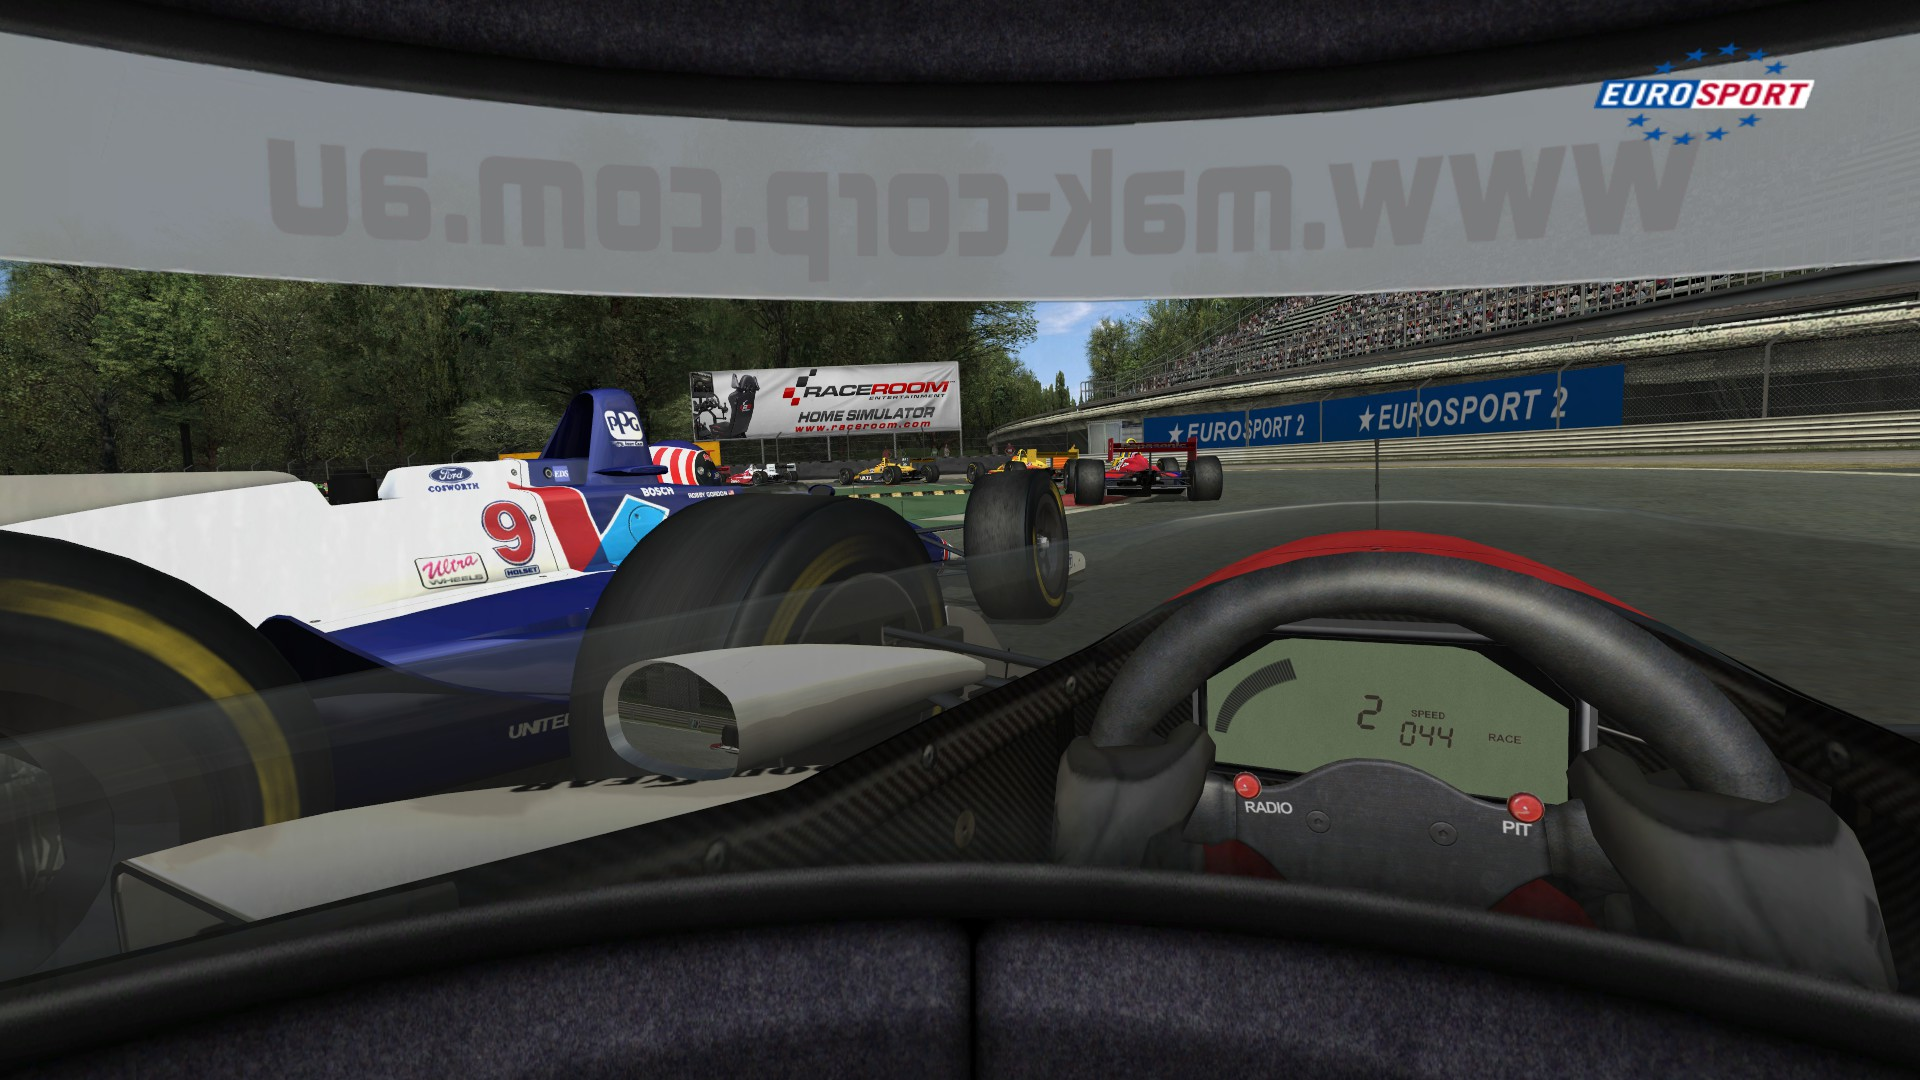 Cart 1994 1995 For Race07 Released Virtualr Net Sim